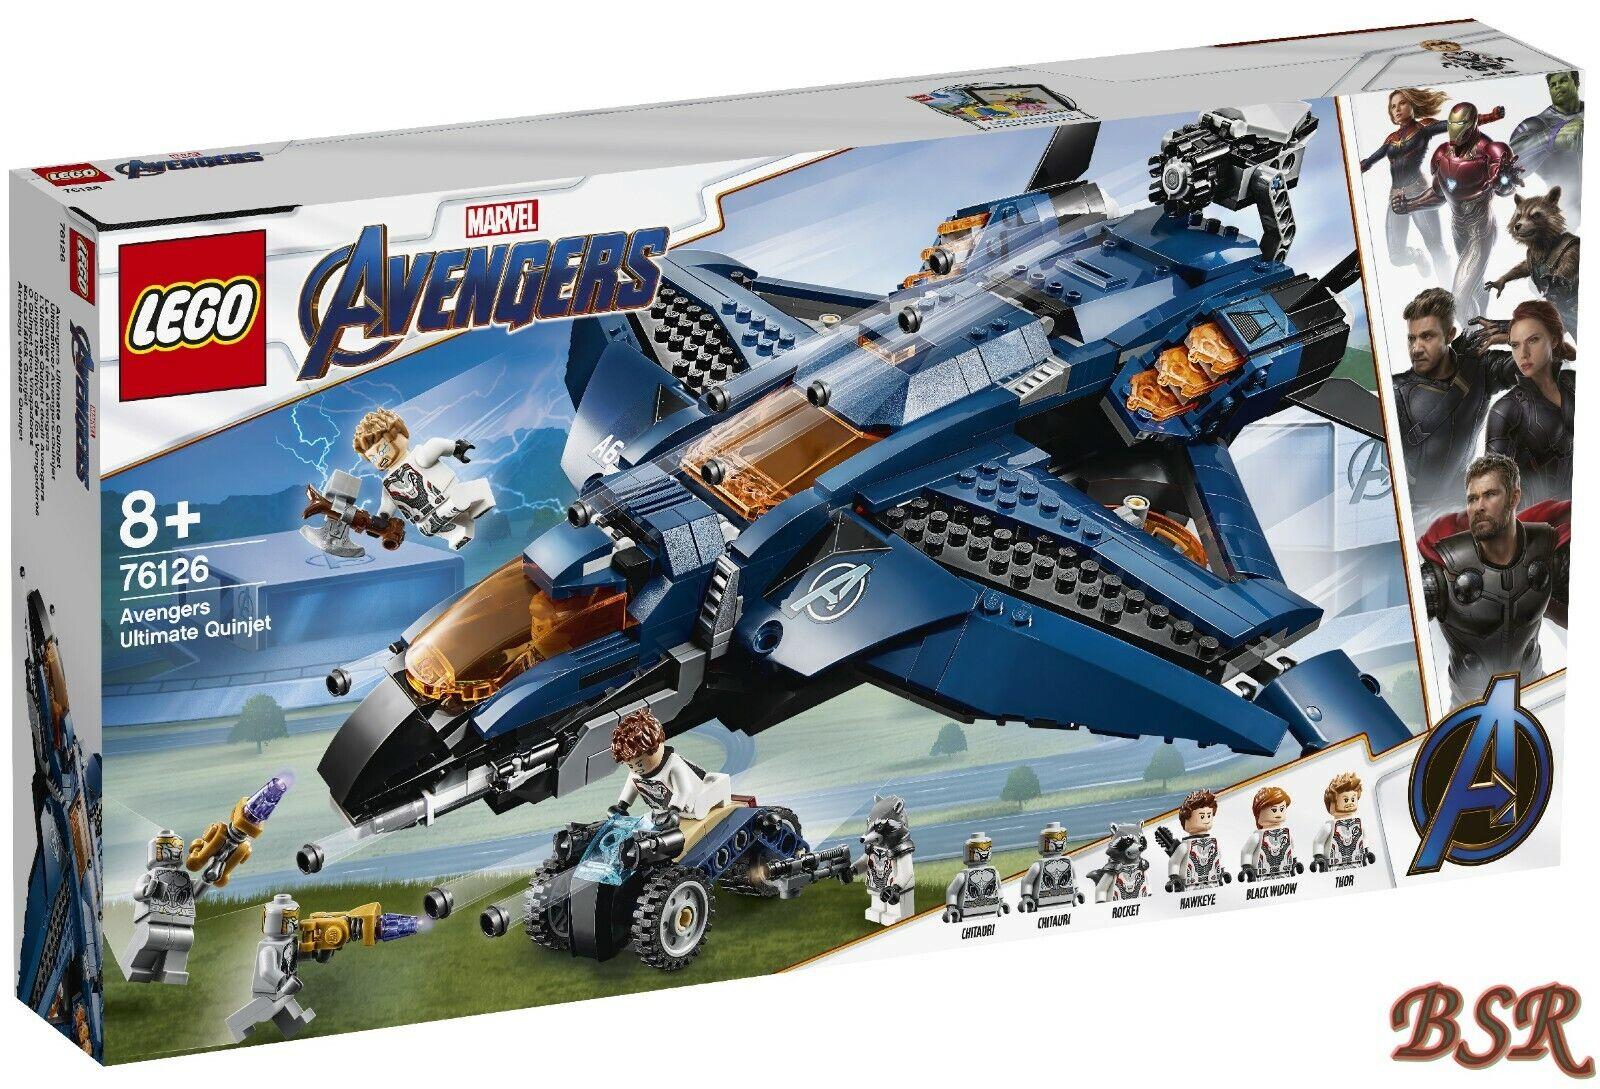 LEGO ® Marvel Avengers  76126 massima Avengers-Quinjet & 0.  Spedizione NUOVO OVP